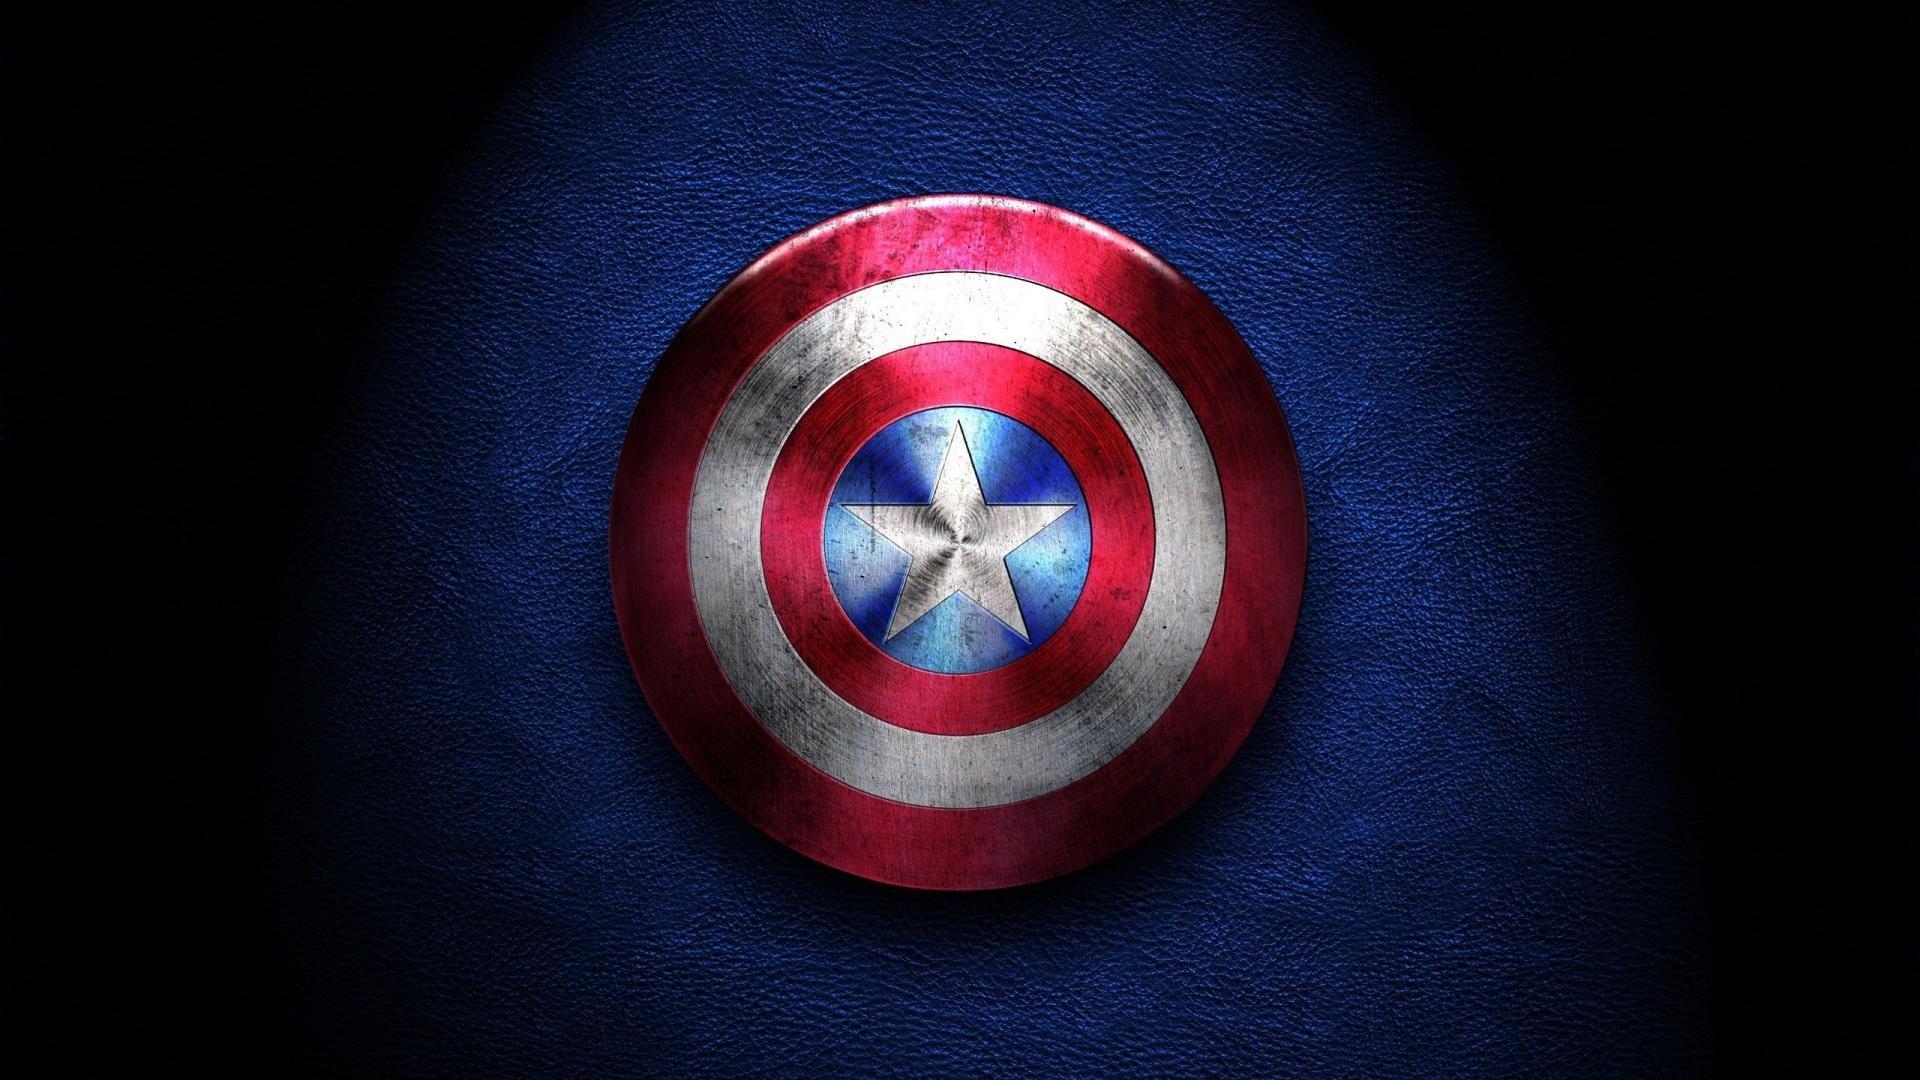 Captain america marvel comics artwork logos shield wallpaper